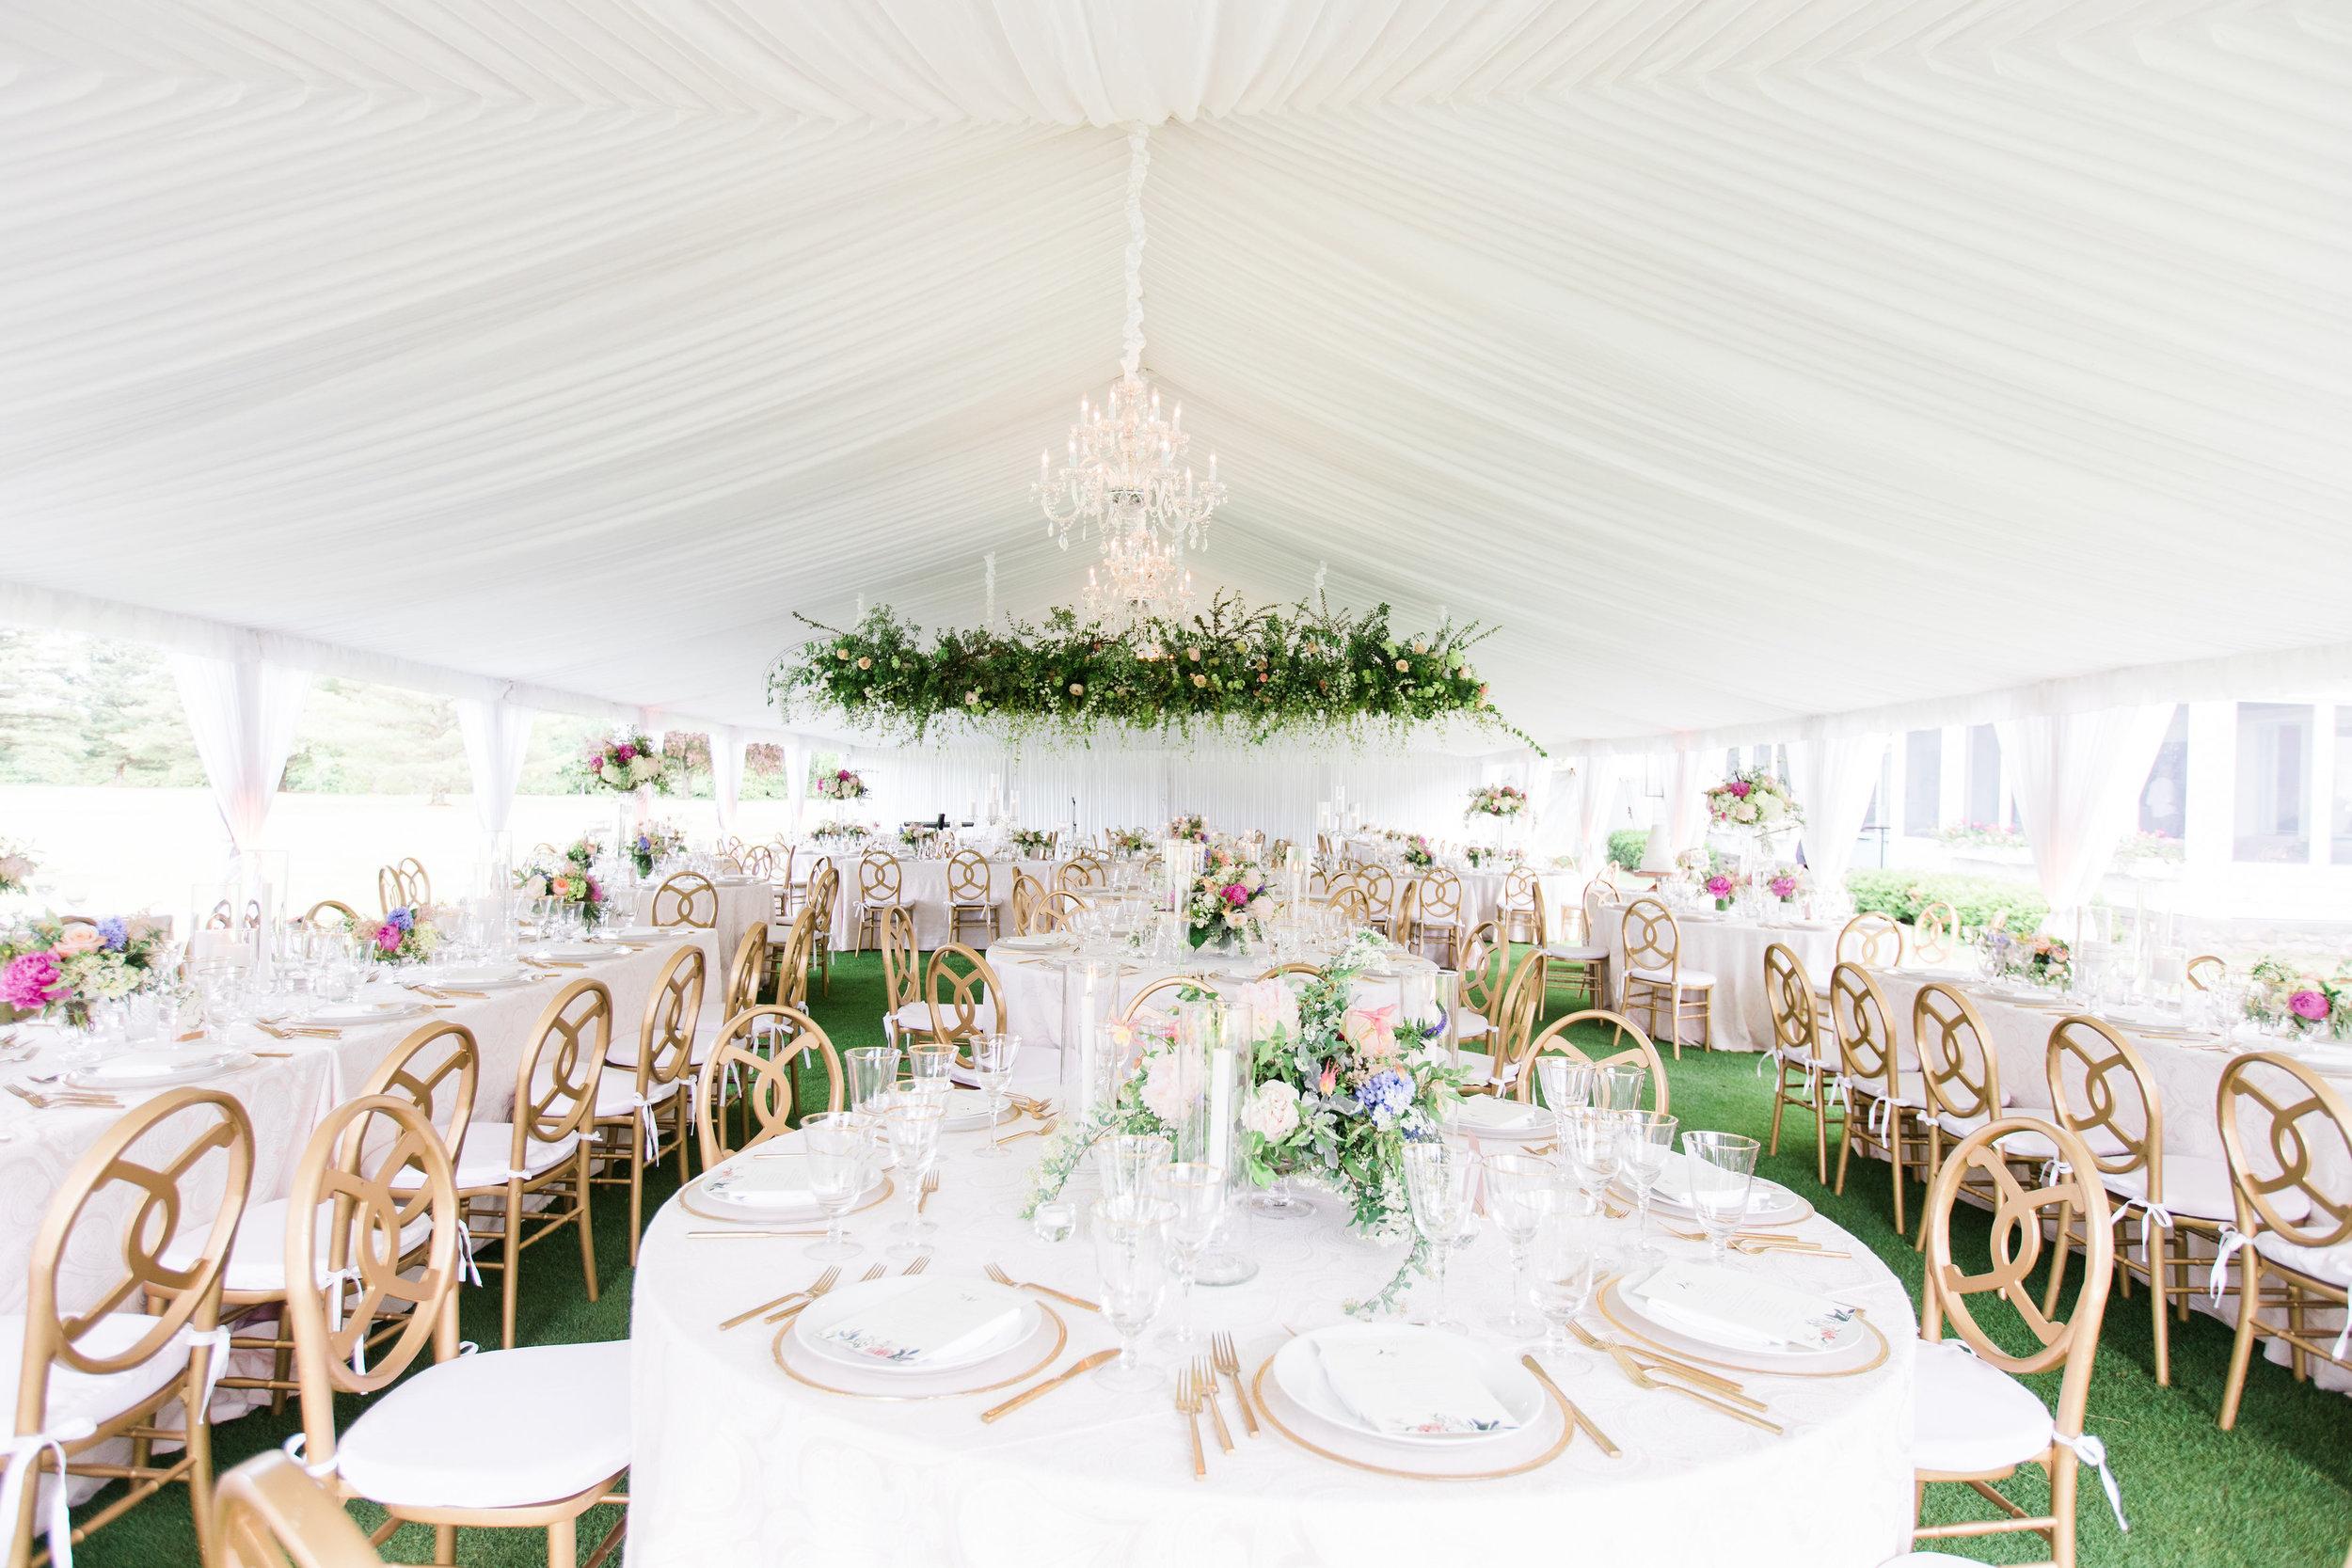 Coffman+Wedding+Reception+Details-53.jpg